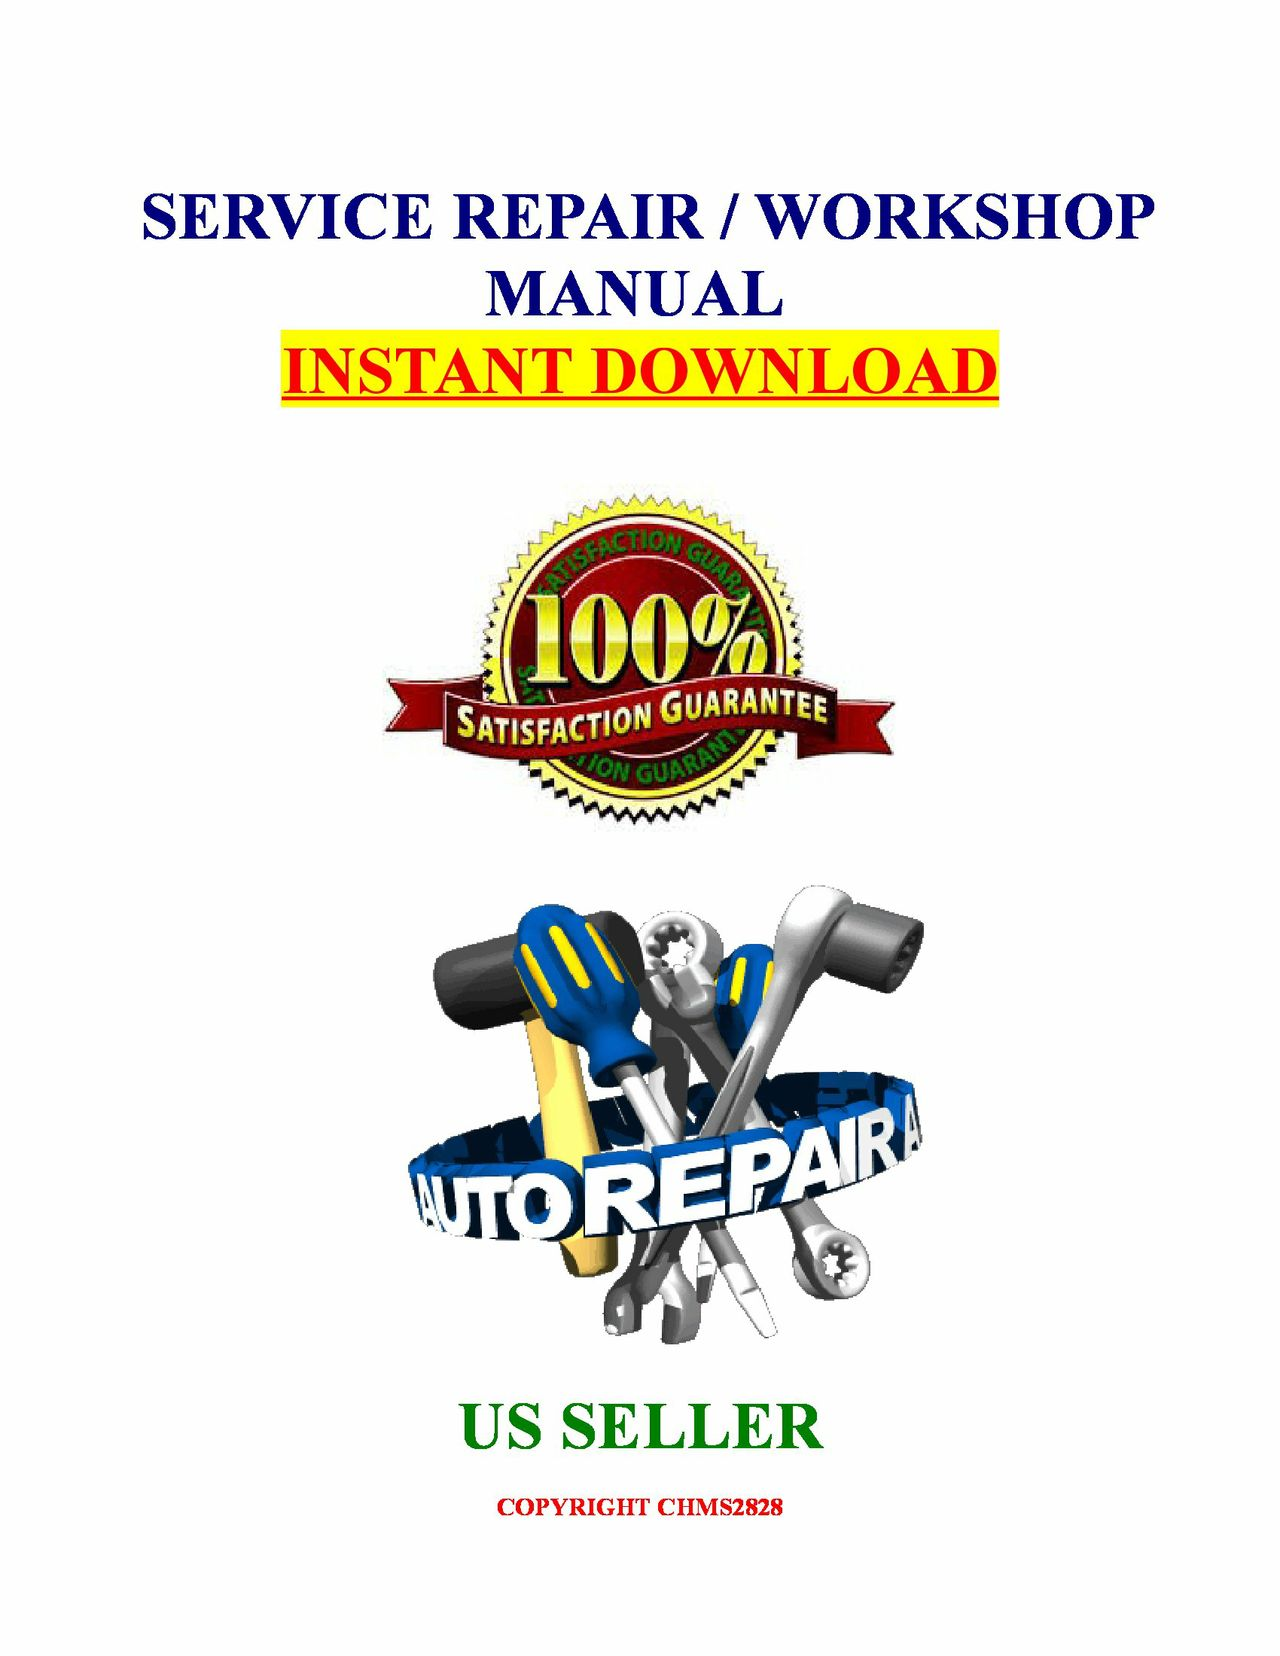 Bmw R80gs R100r 1988 1989 1990 1991 1992 1993 1994  Motorcycle Service Repair Manual download